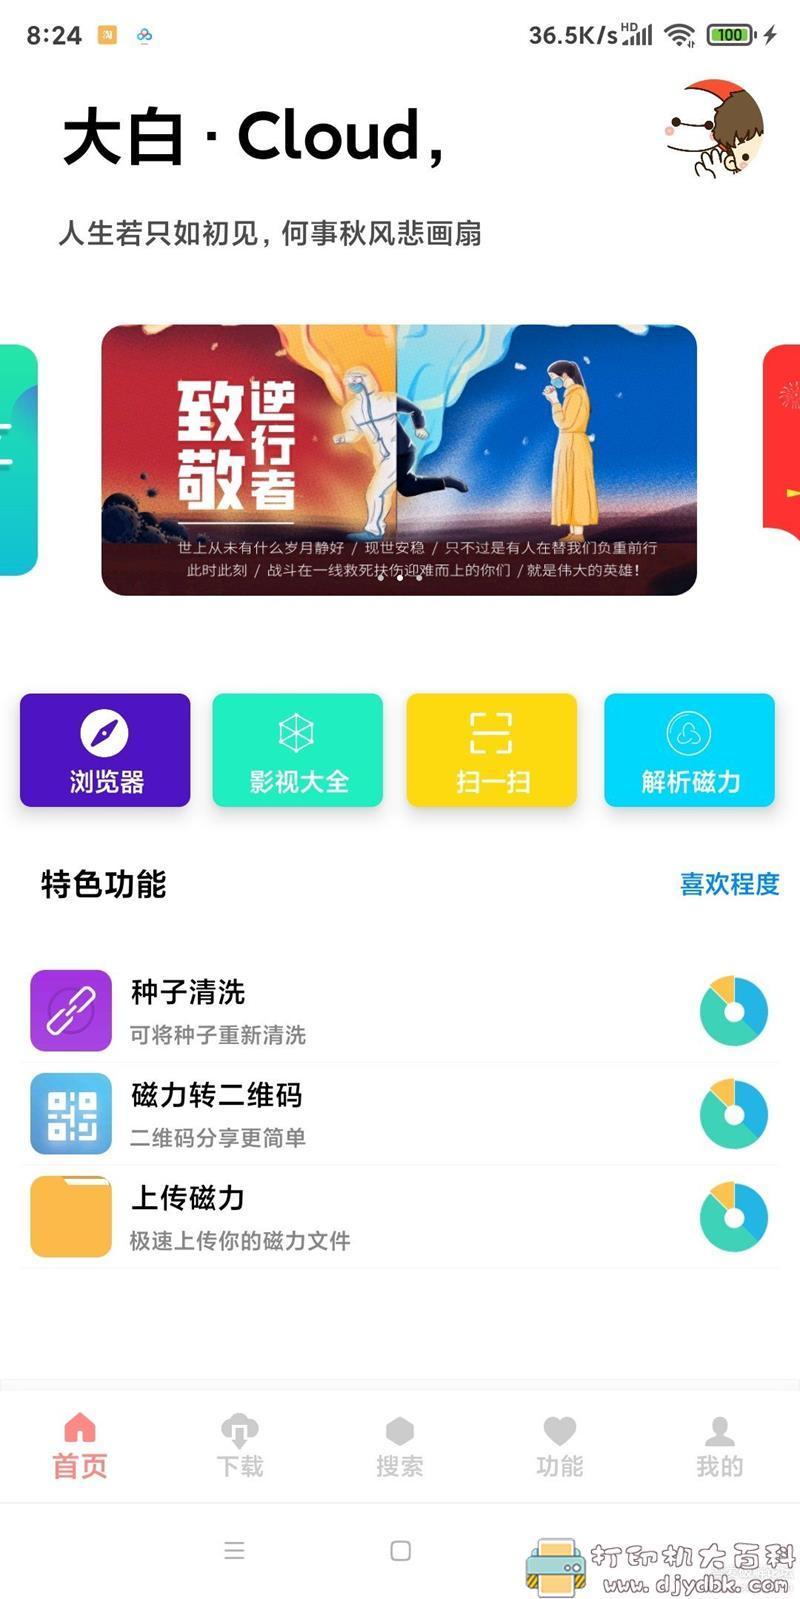 [Android]X浏览器+大白磁力+小说阅读大全图片 No.2